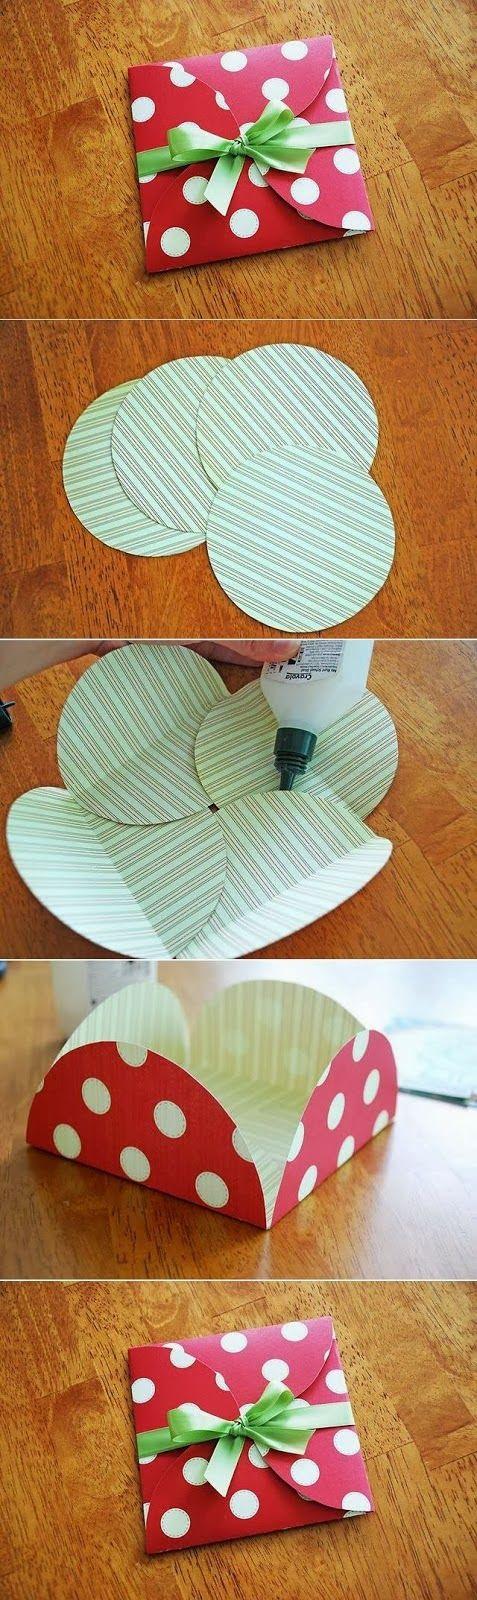 Make-a-Simple-Beautiful-Envelope-745268.jpg (477×1600)